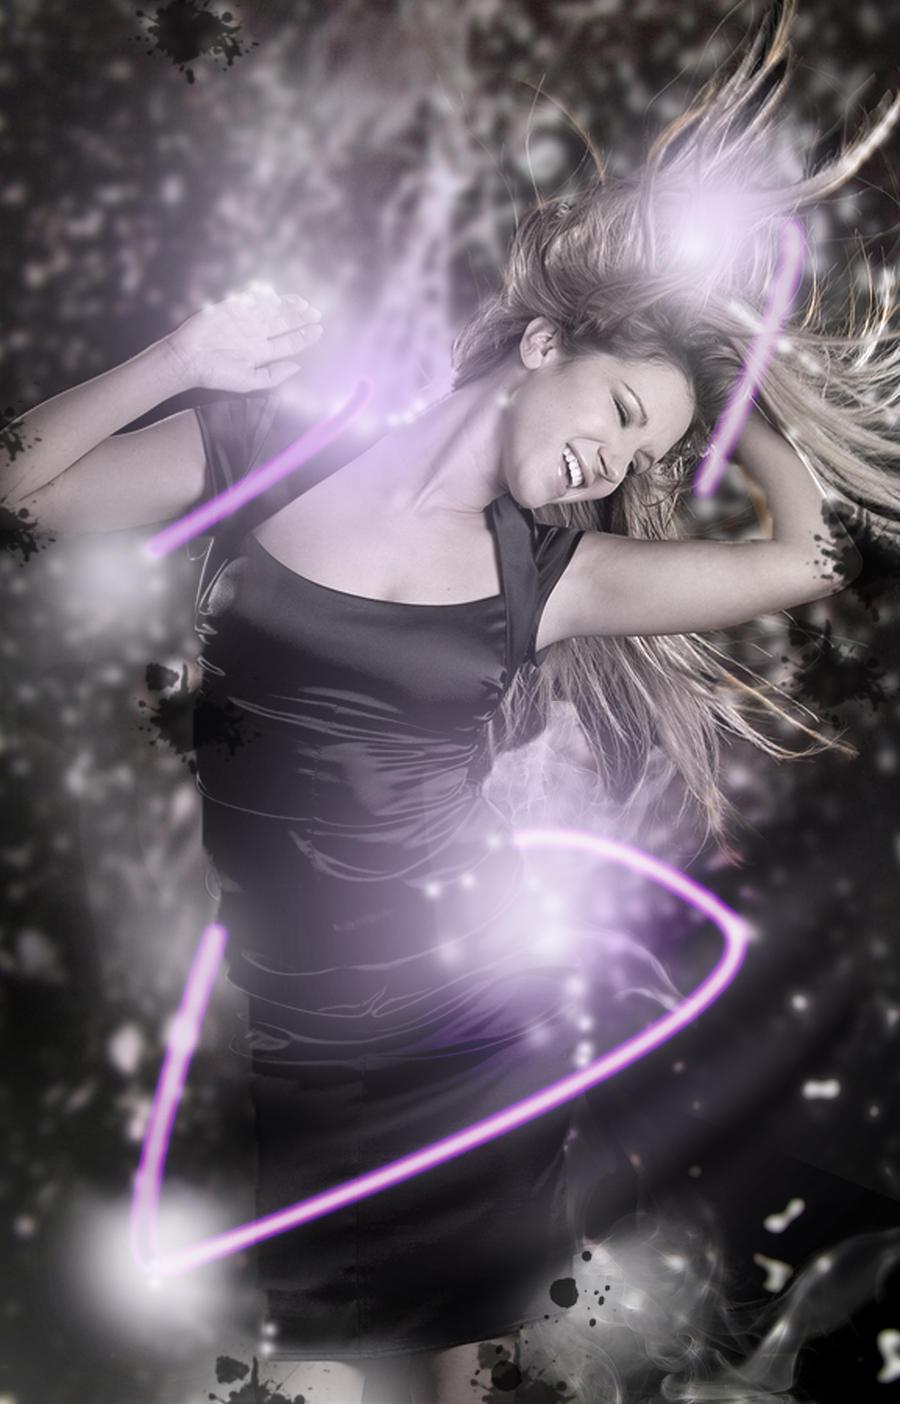 Dancing Woman by ravinsilverlock